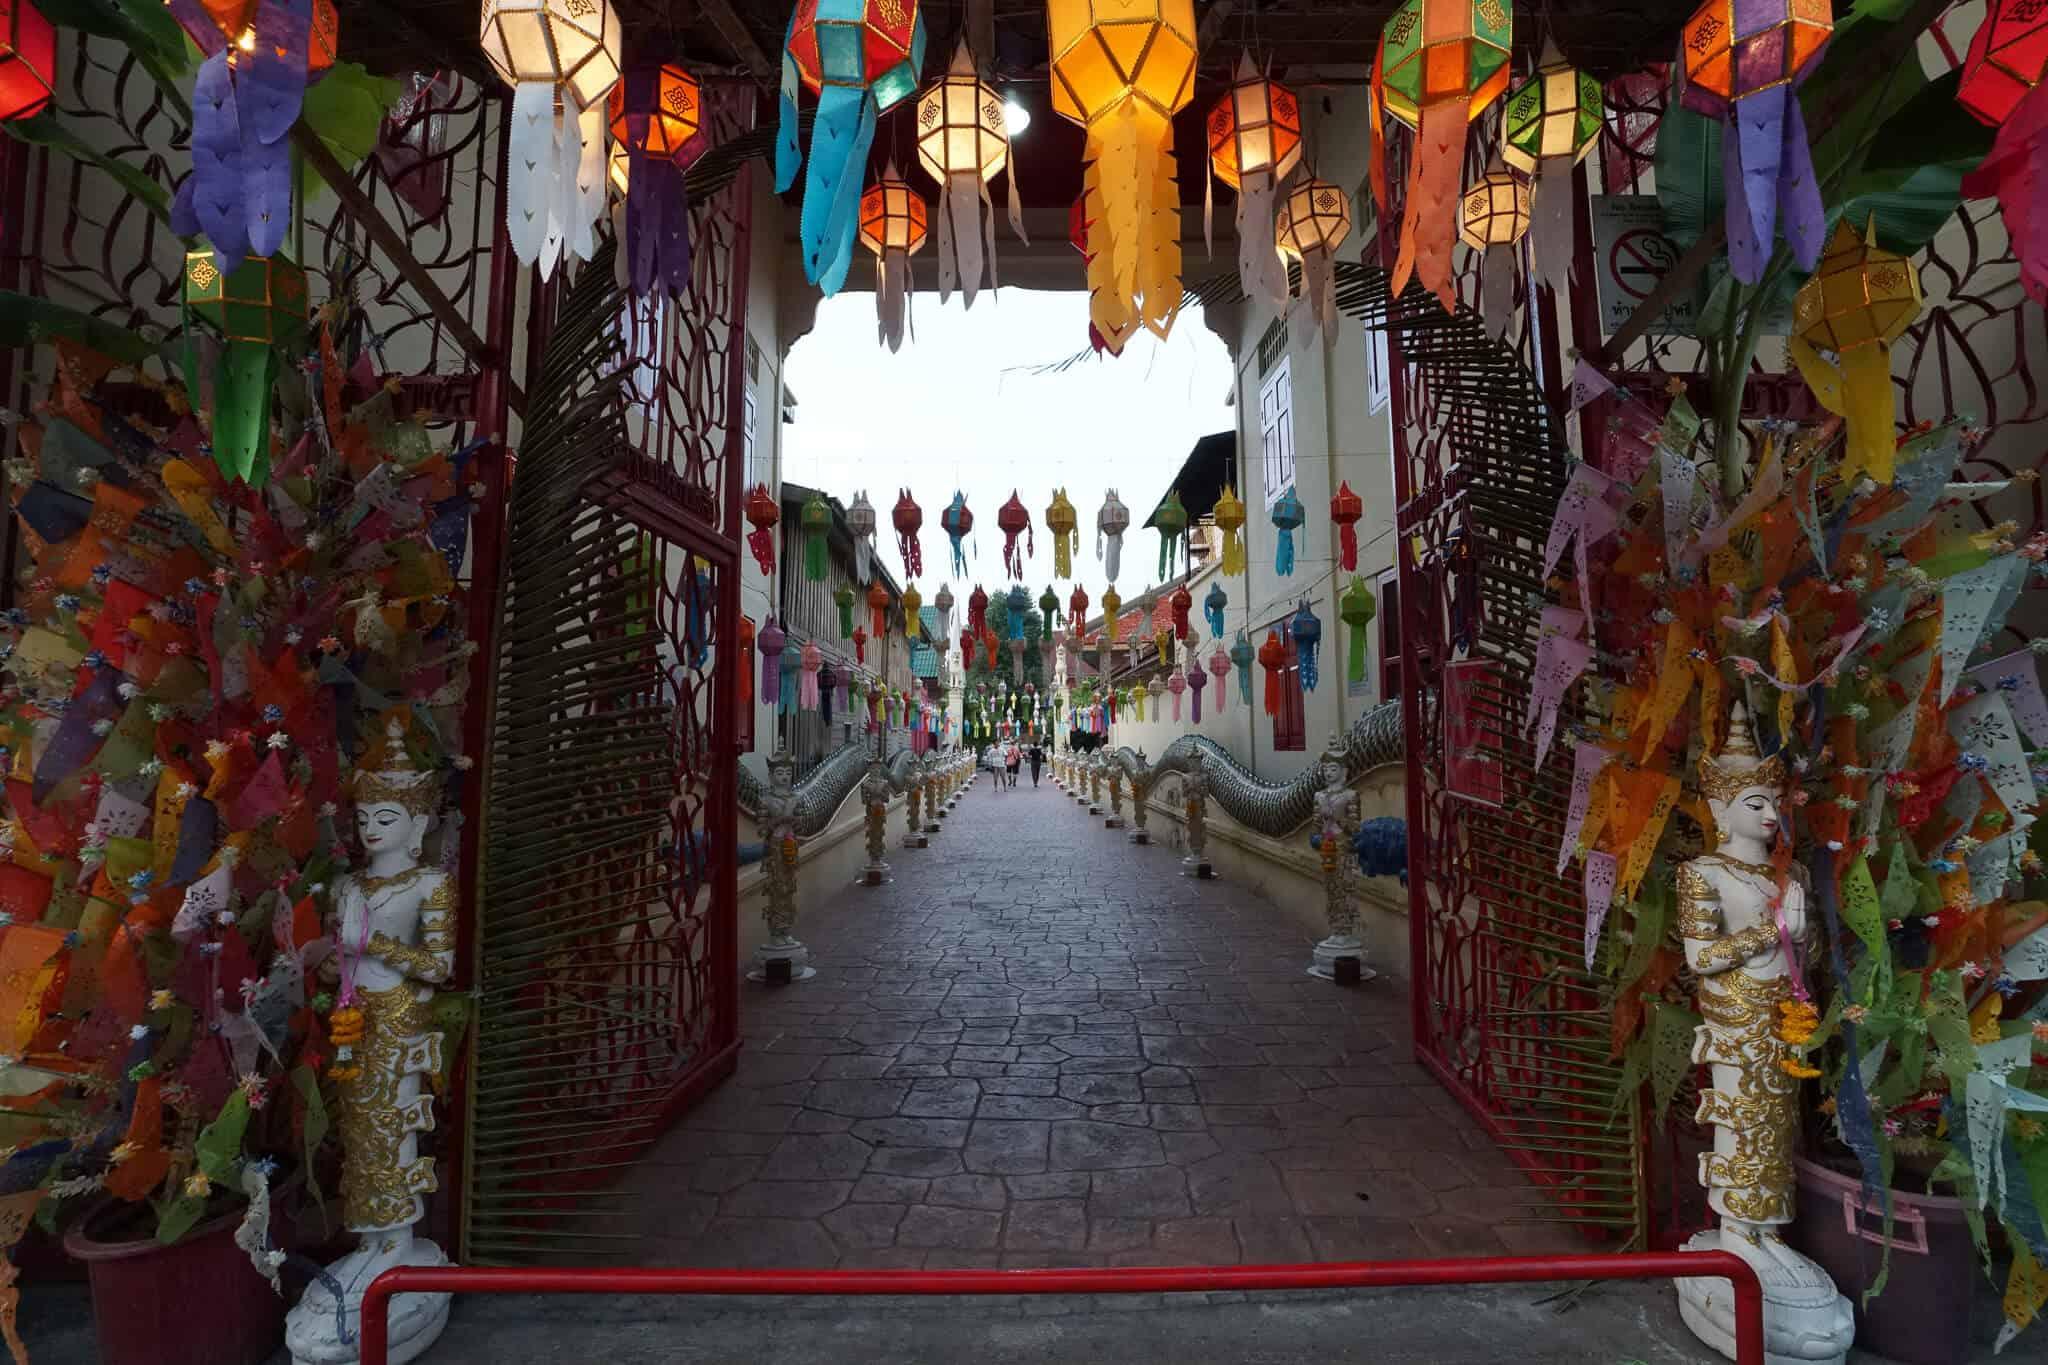 Chiang Mai Loy Krathong